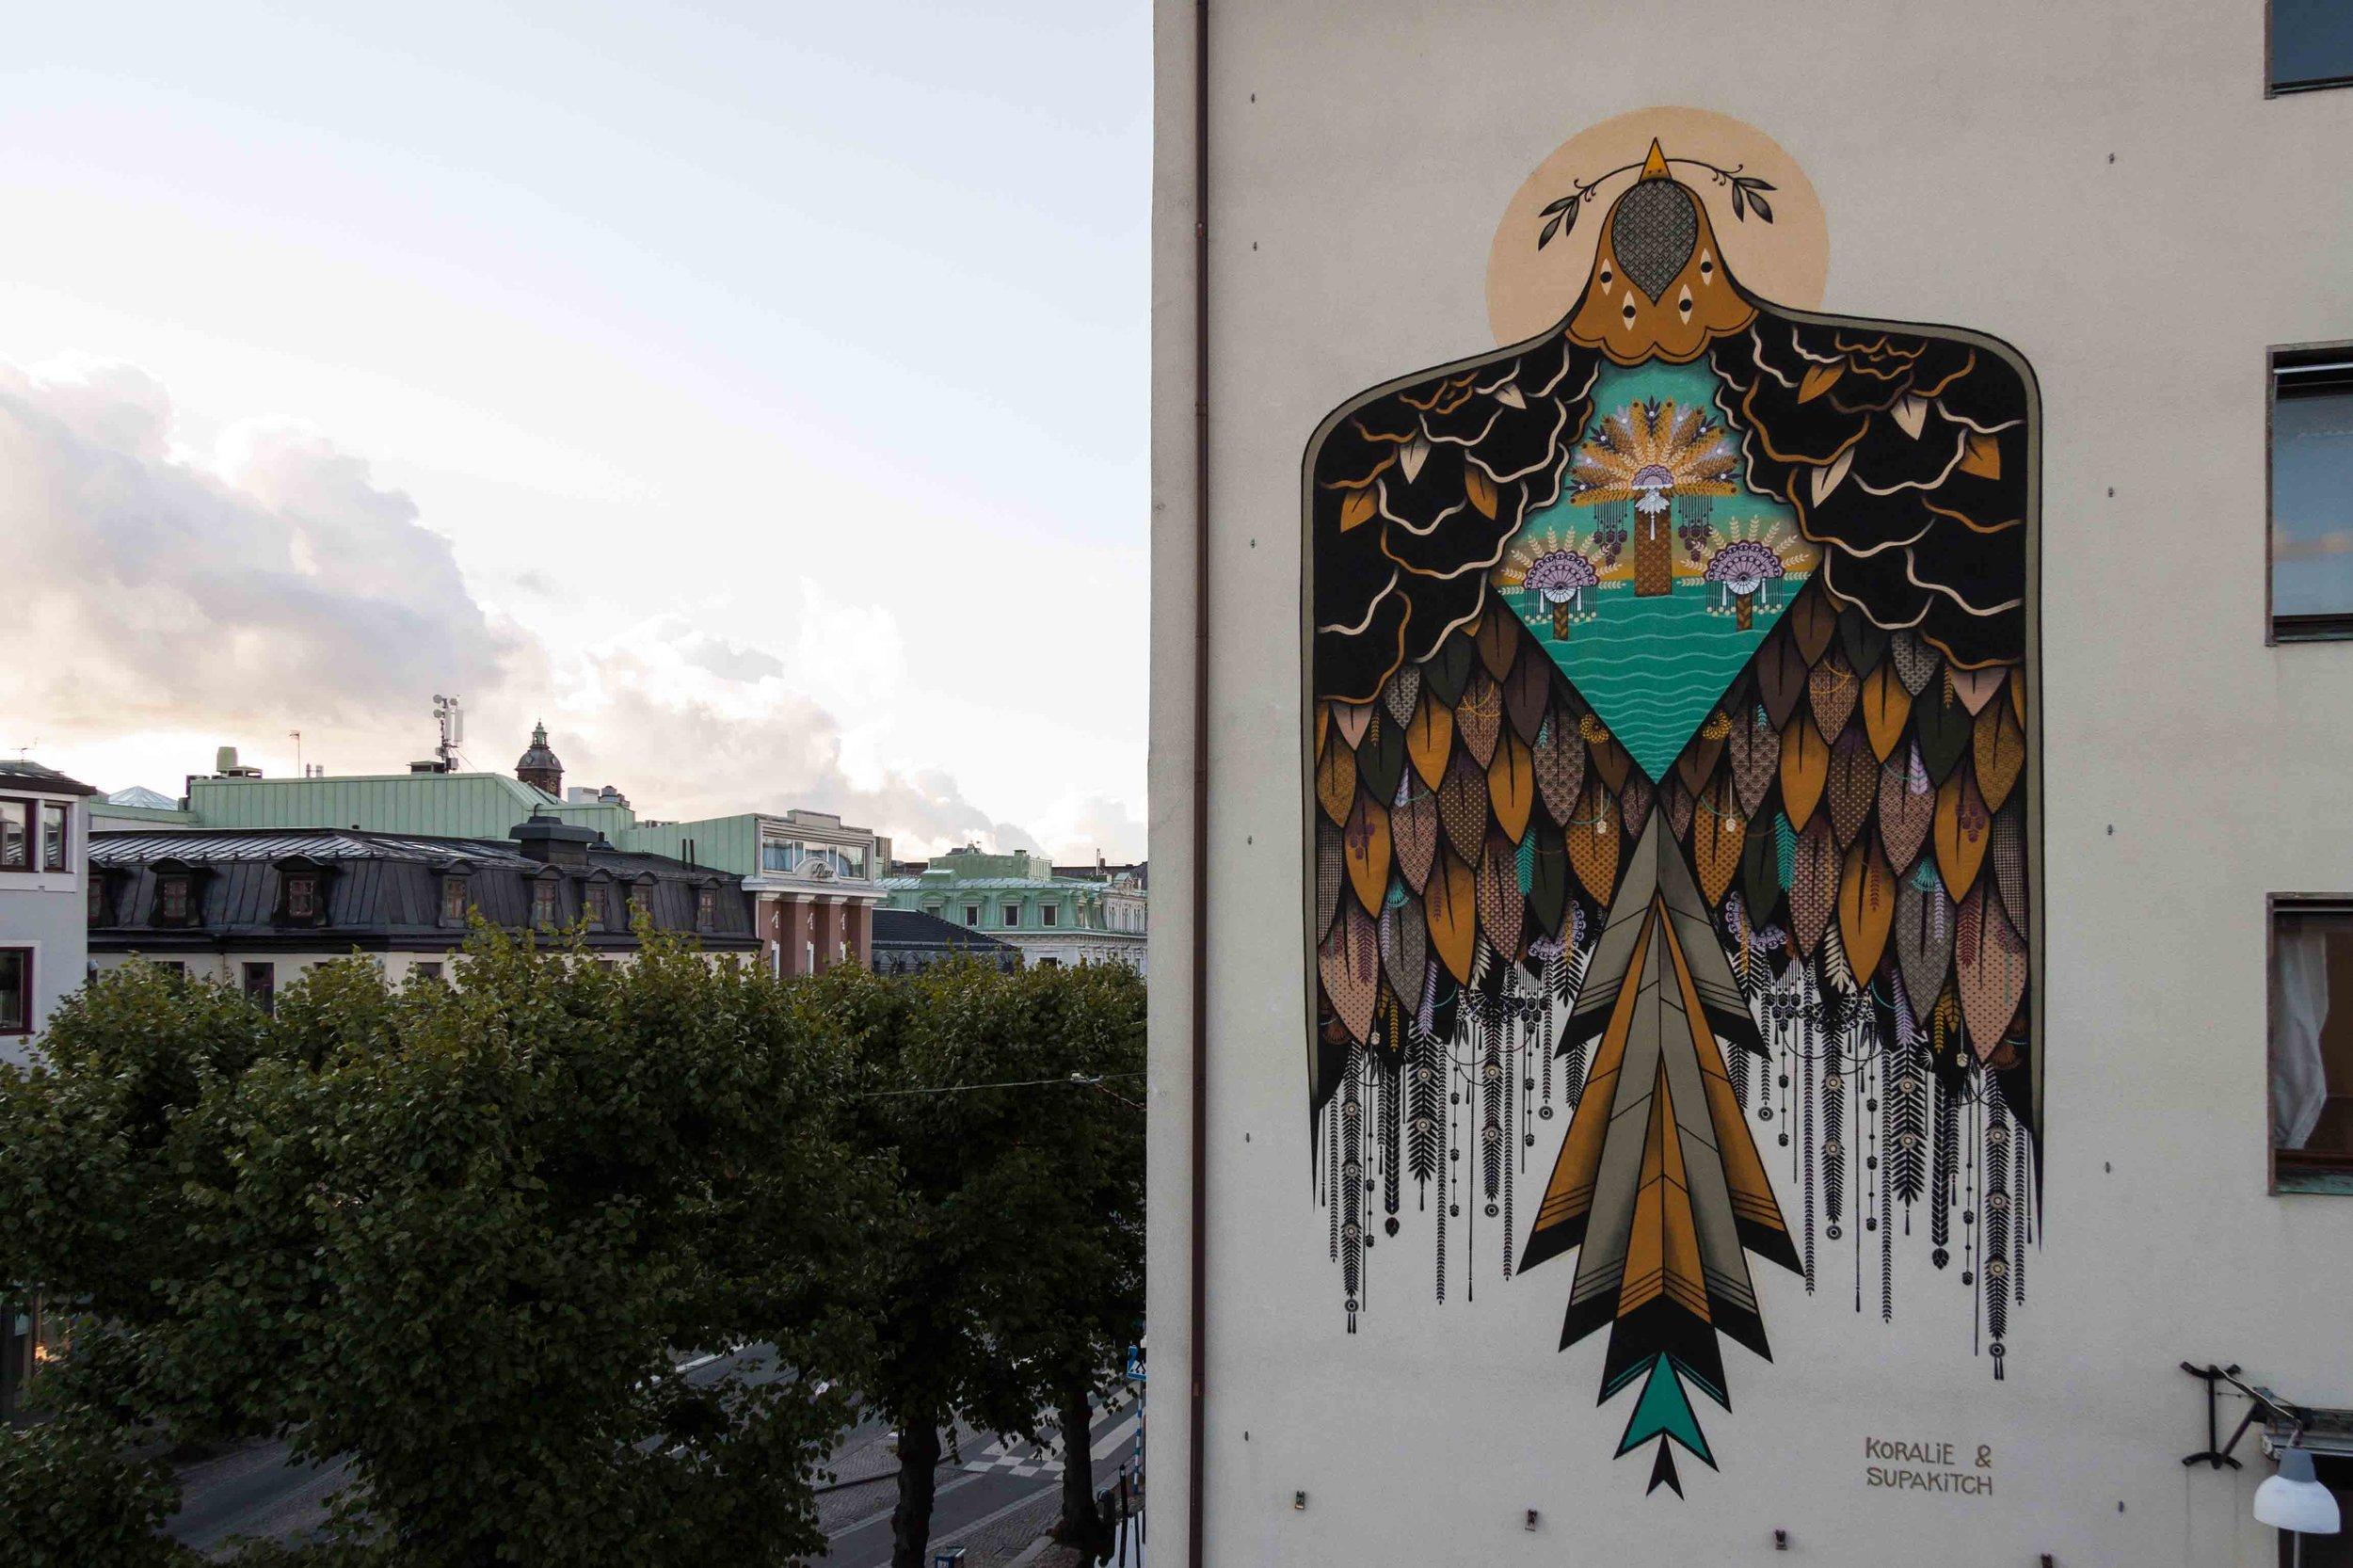 KORALIE&SUPAKITSCH_Artscape_2016-08-11_FredrikÅkerberg_4610x3073_24.jpg